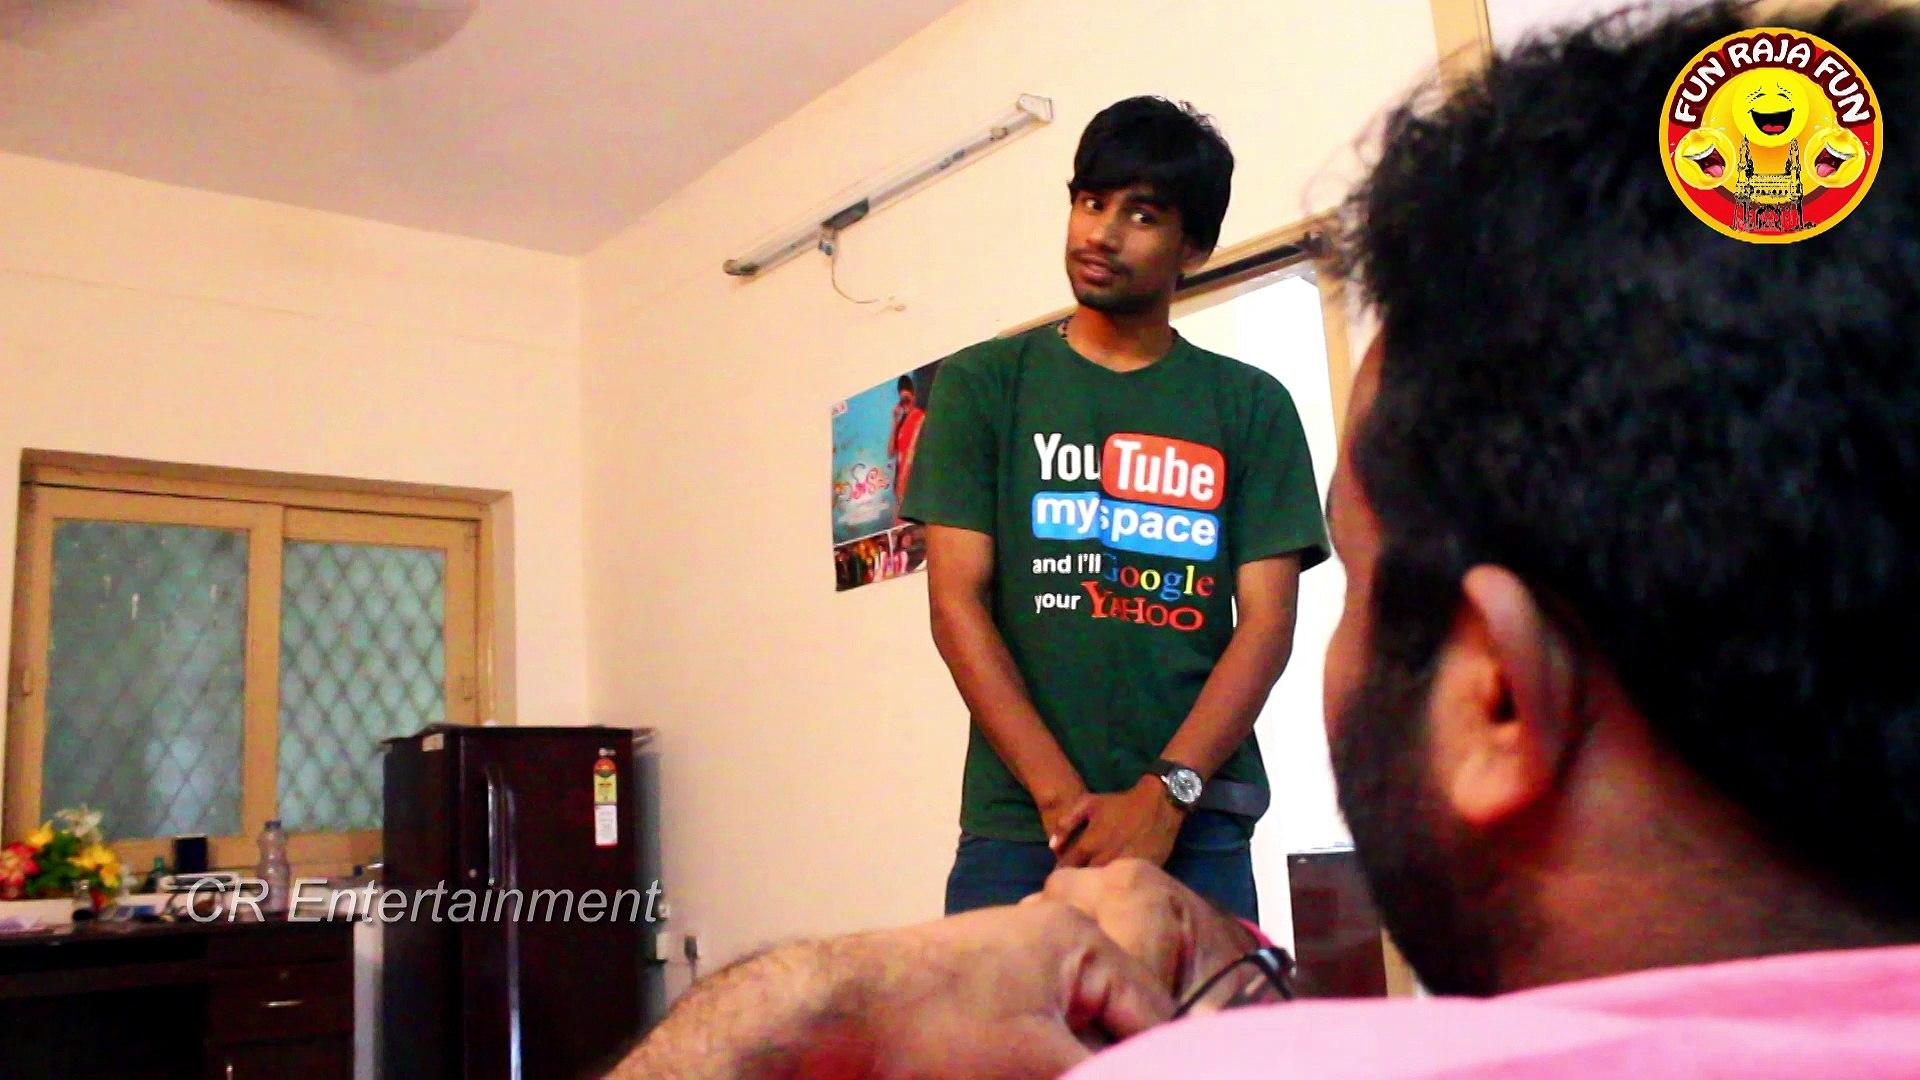 Fun Raja Fun ll Jeberdast Latest fun comedy ll Episode 7 By @ Sridhar Ambati...